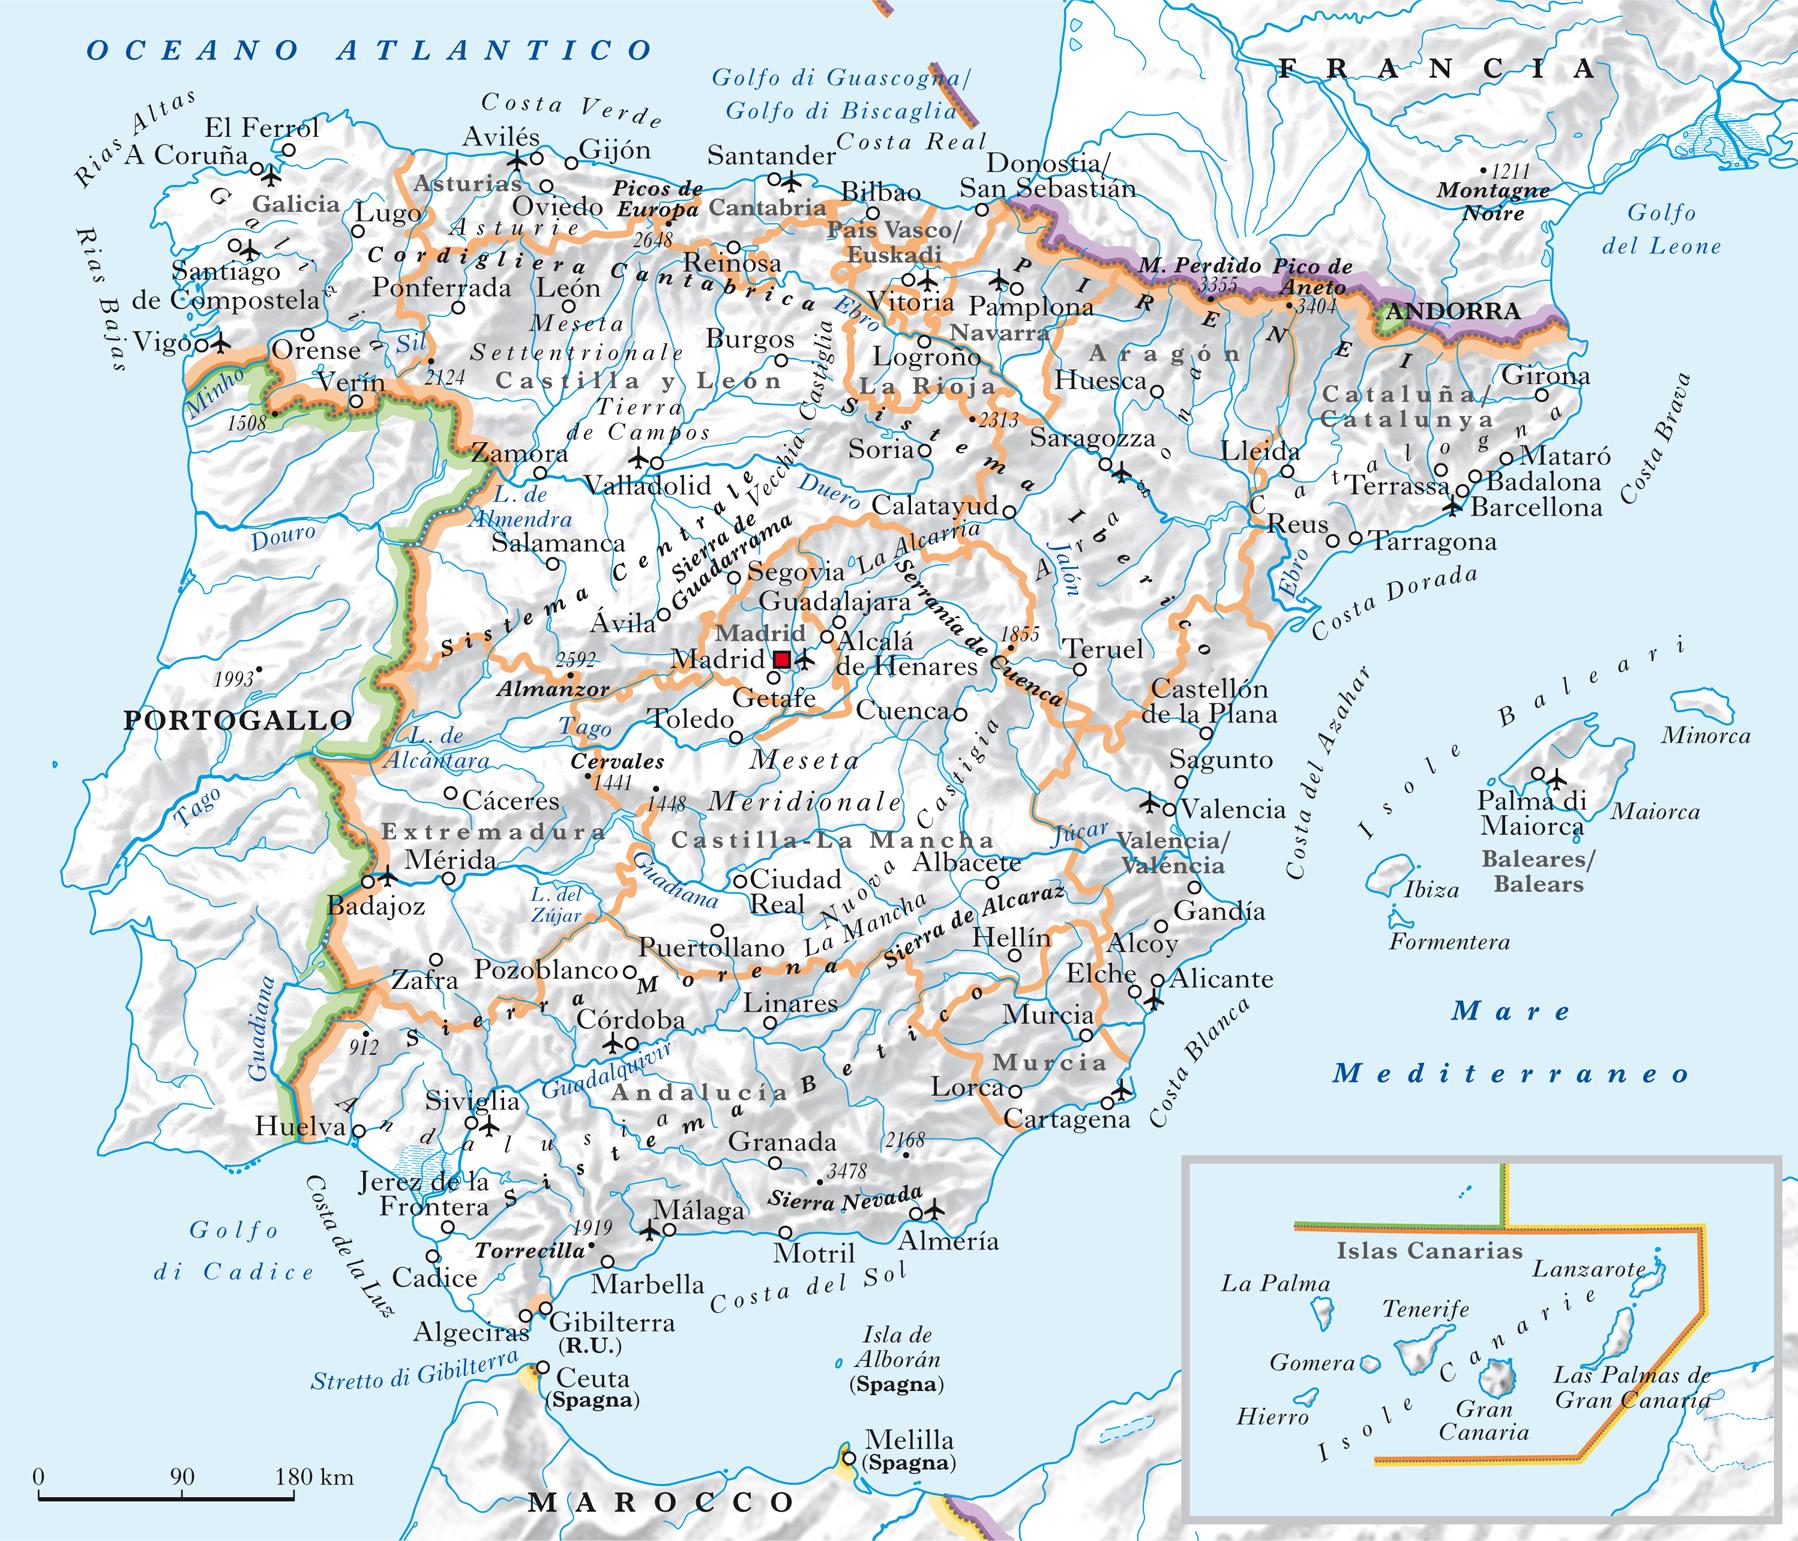 Cartina Rilievi Spagna.Spagna Nell Enciclopedia Treccani